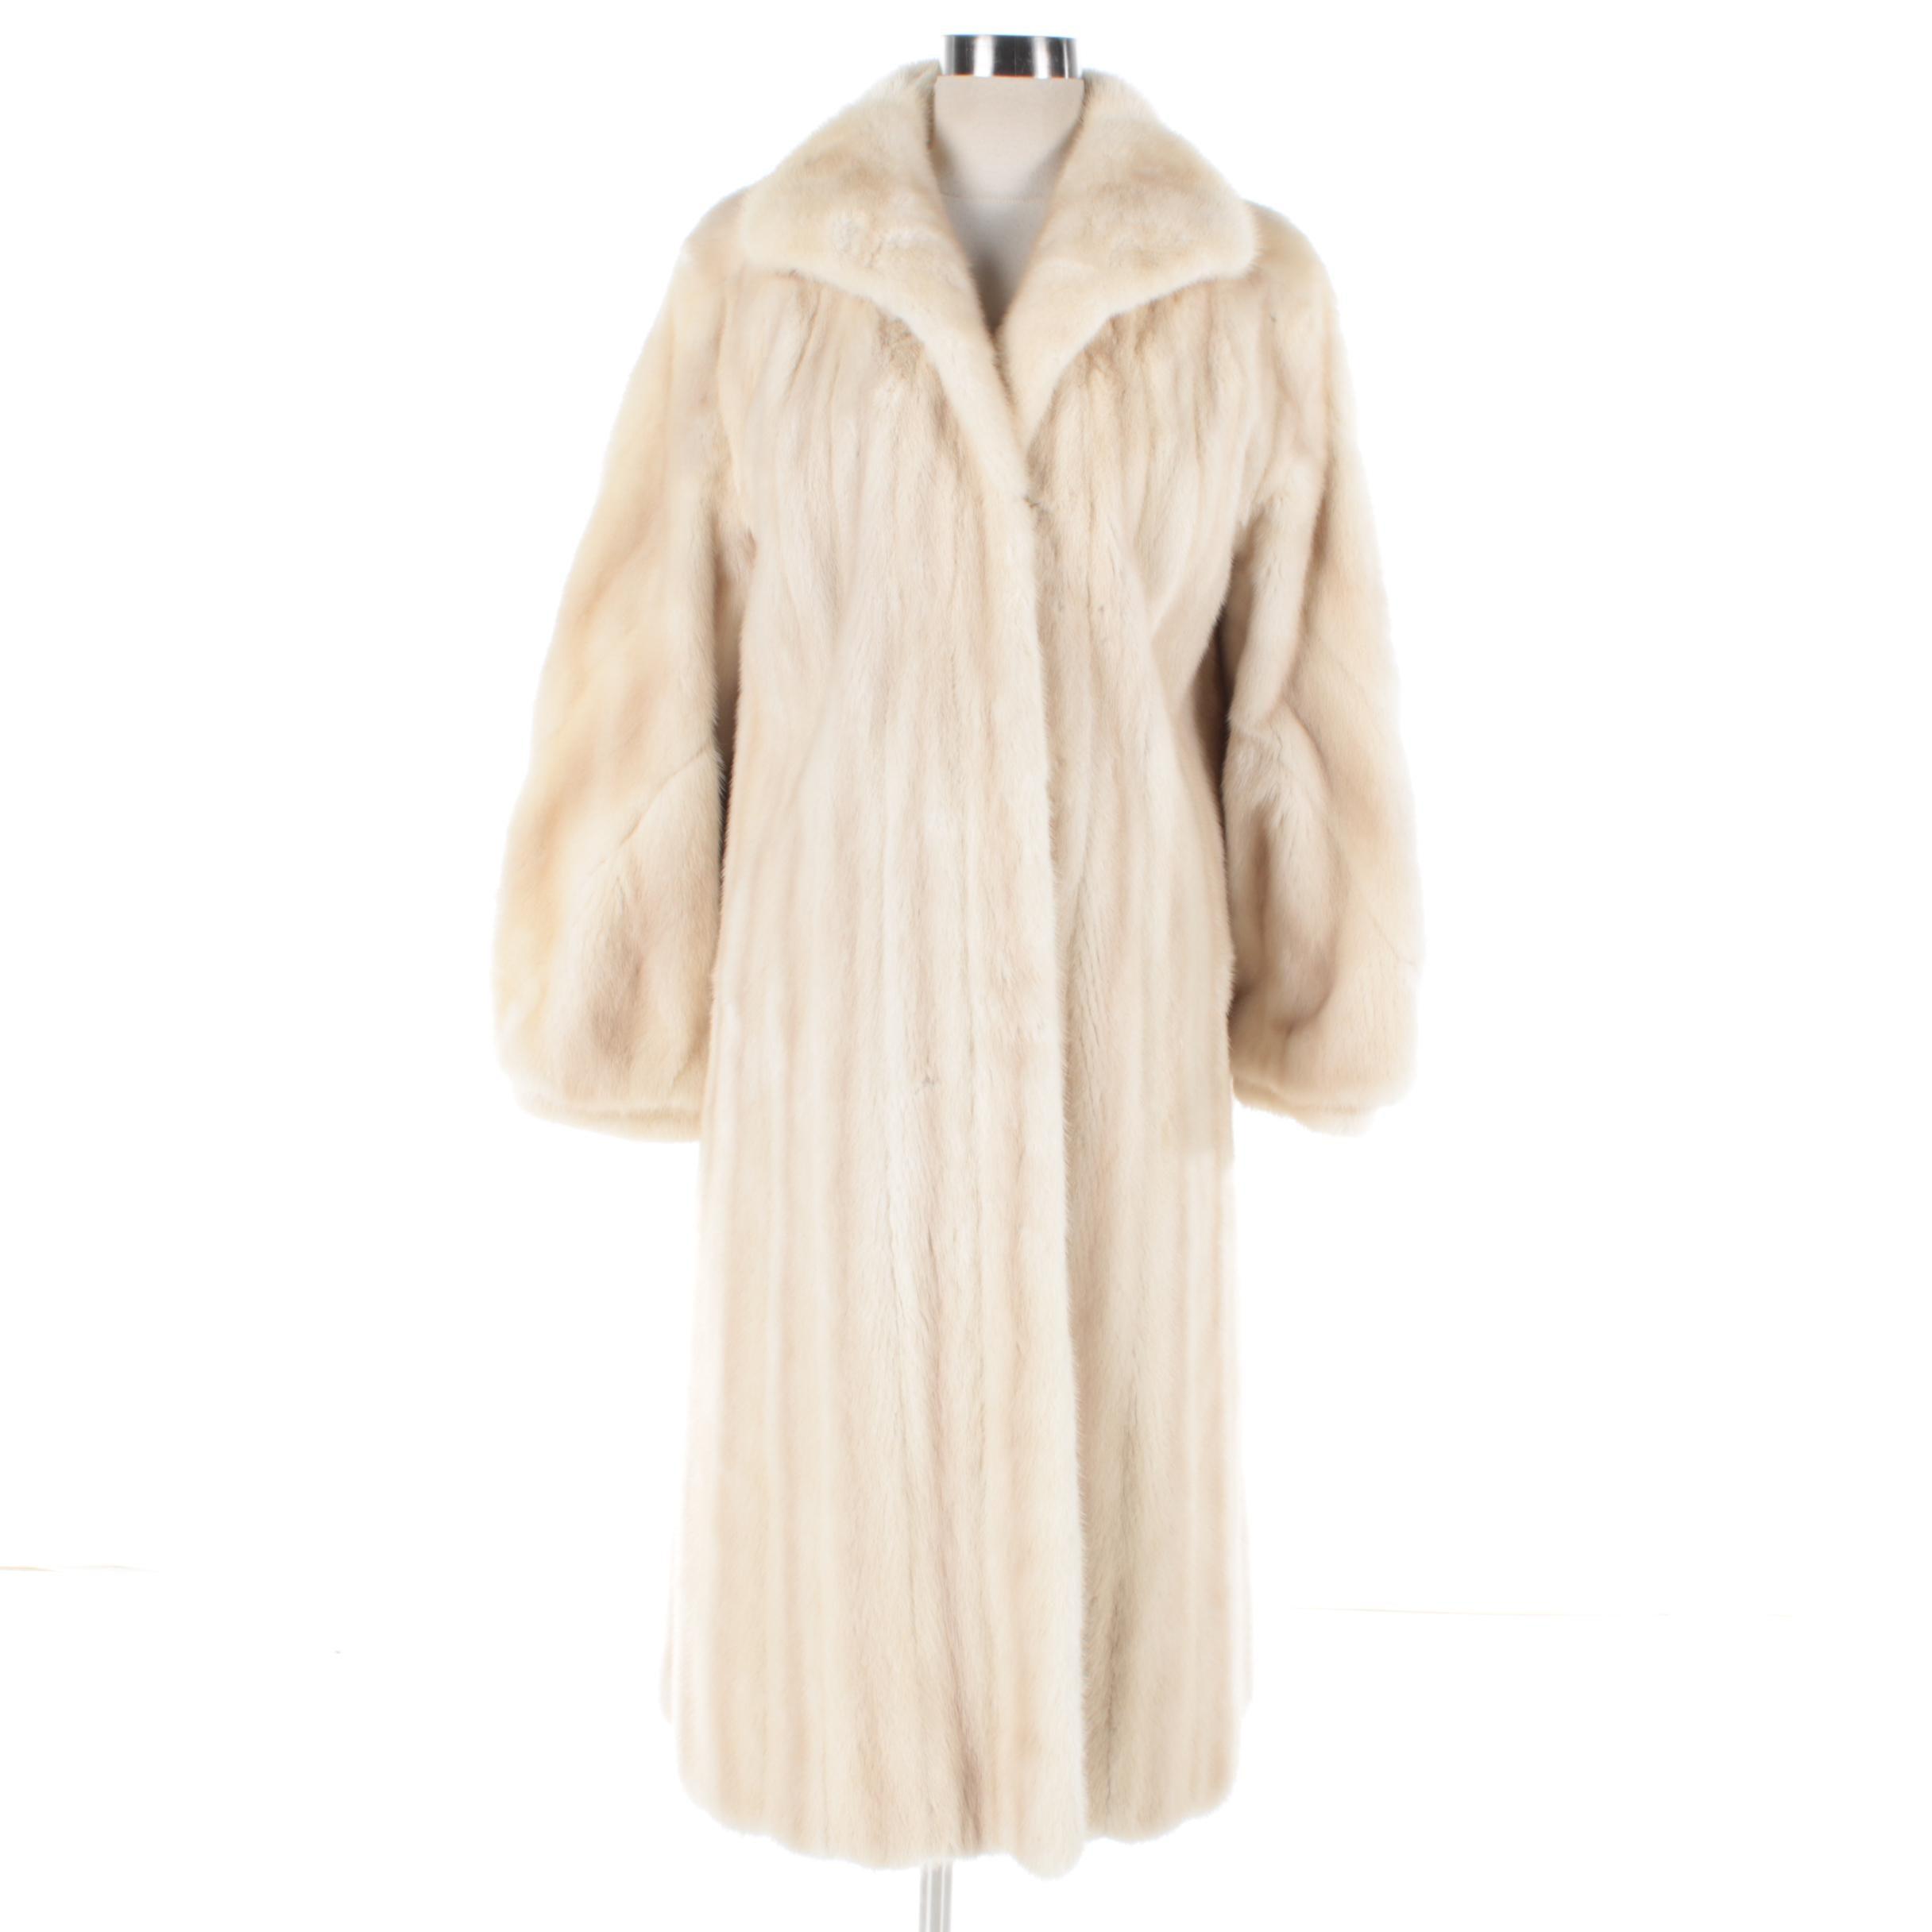 Women's Vintage Kakas Blonde Mink Fur Coat